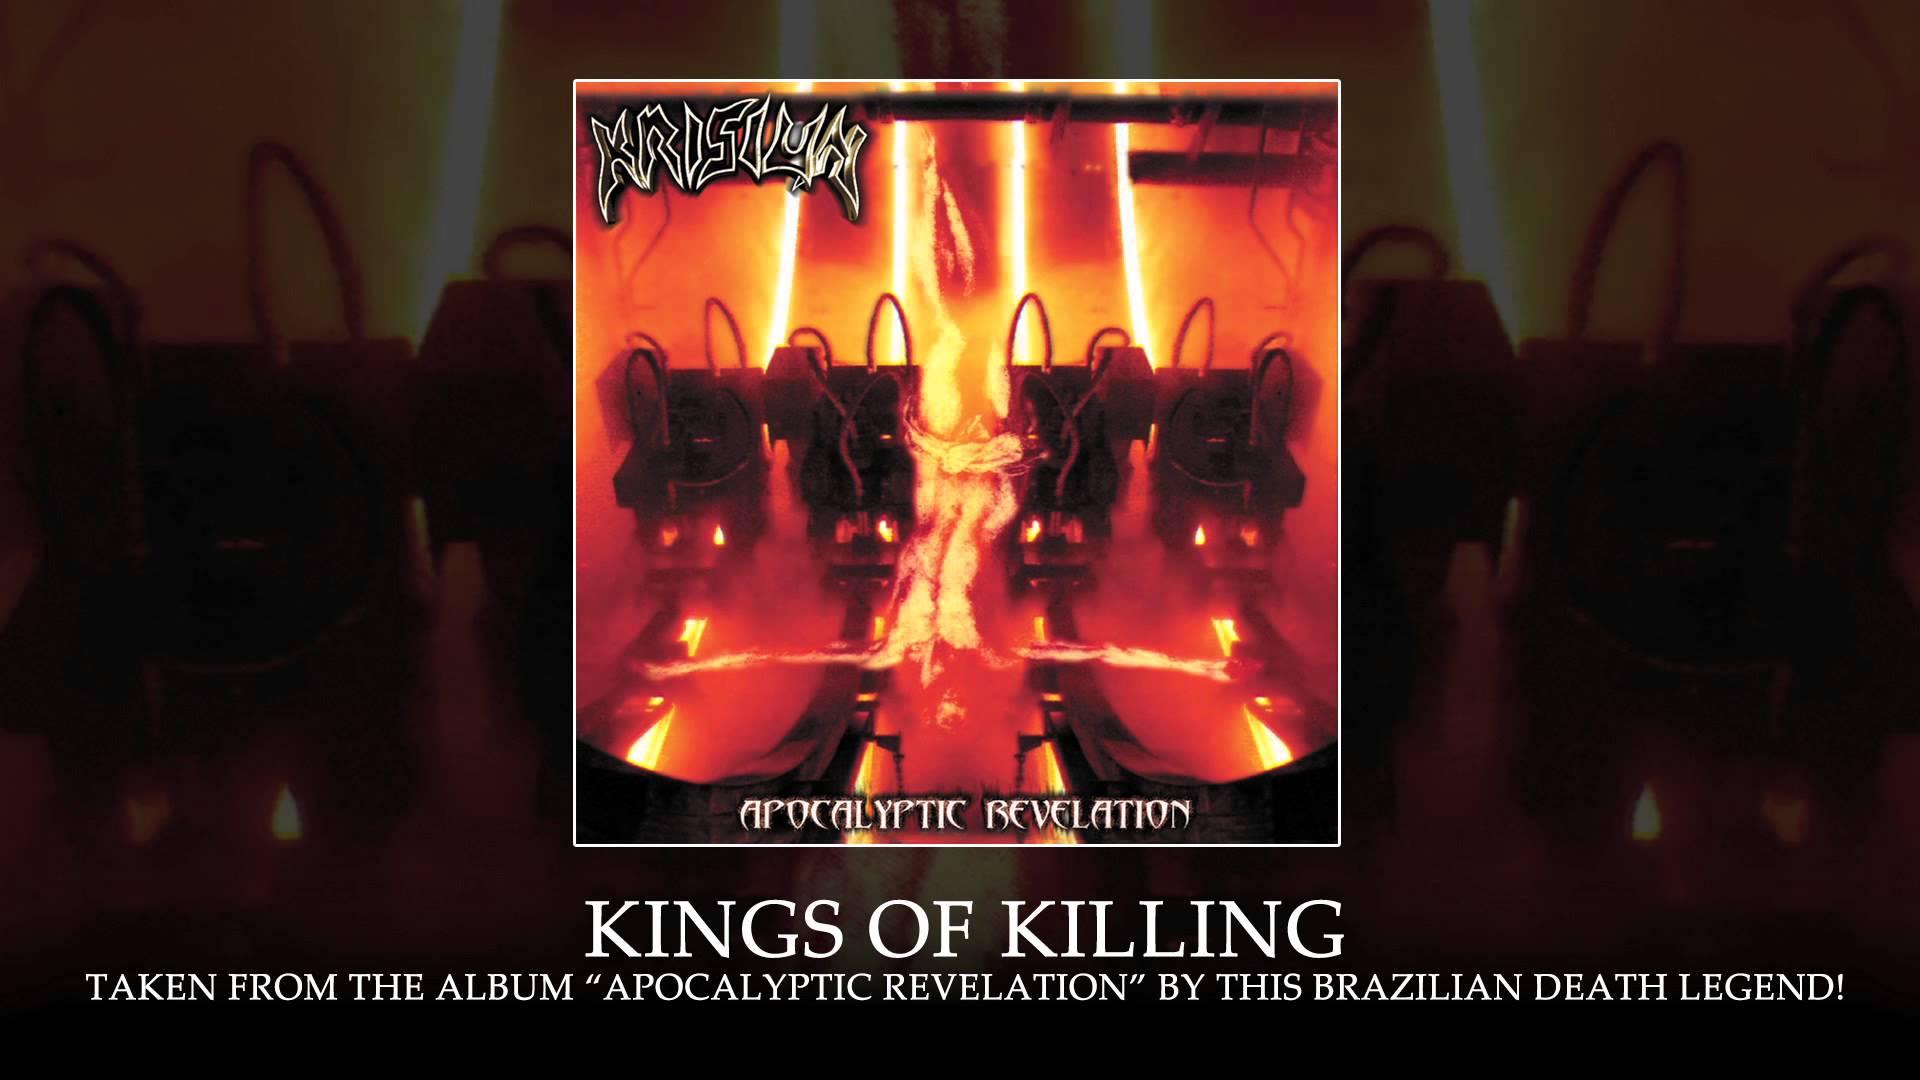 KRISIUN -- Kings Of Killing (ALBUM TRACK)